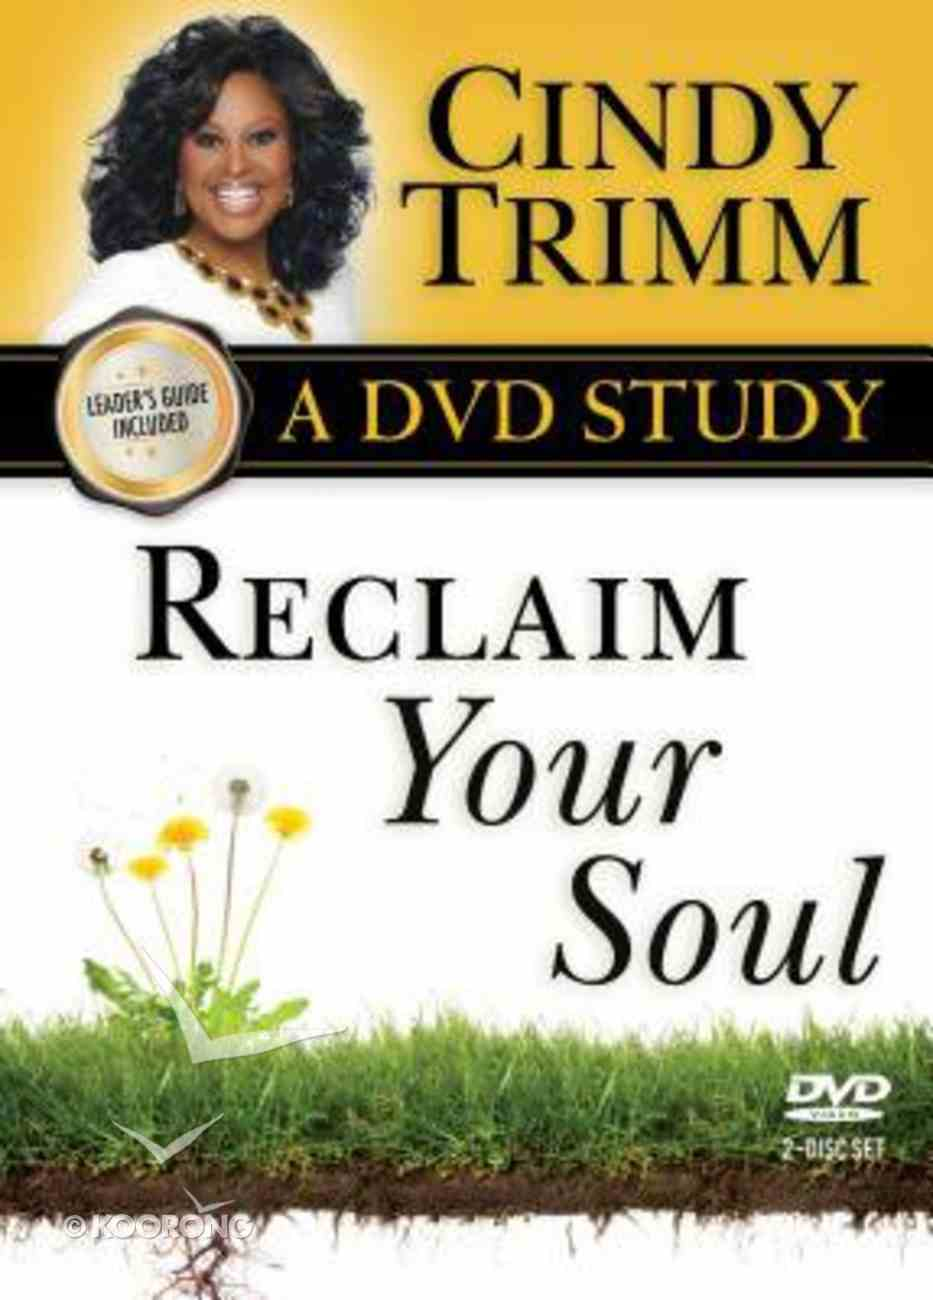 Reclaim Your Soul (Dvd Study) DVD